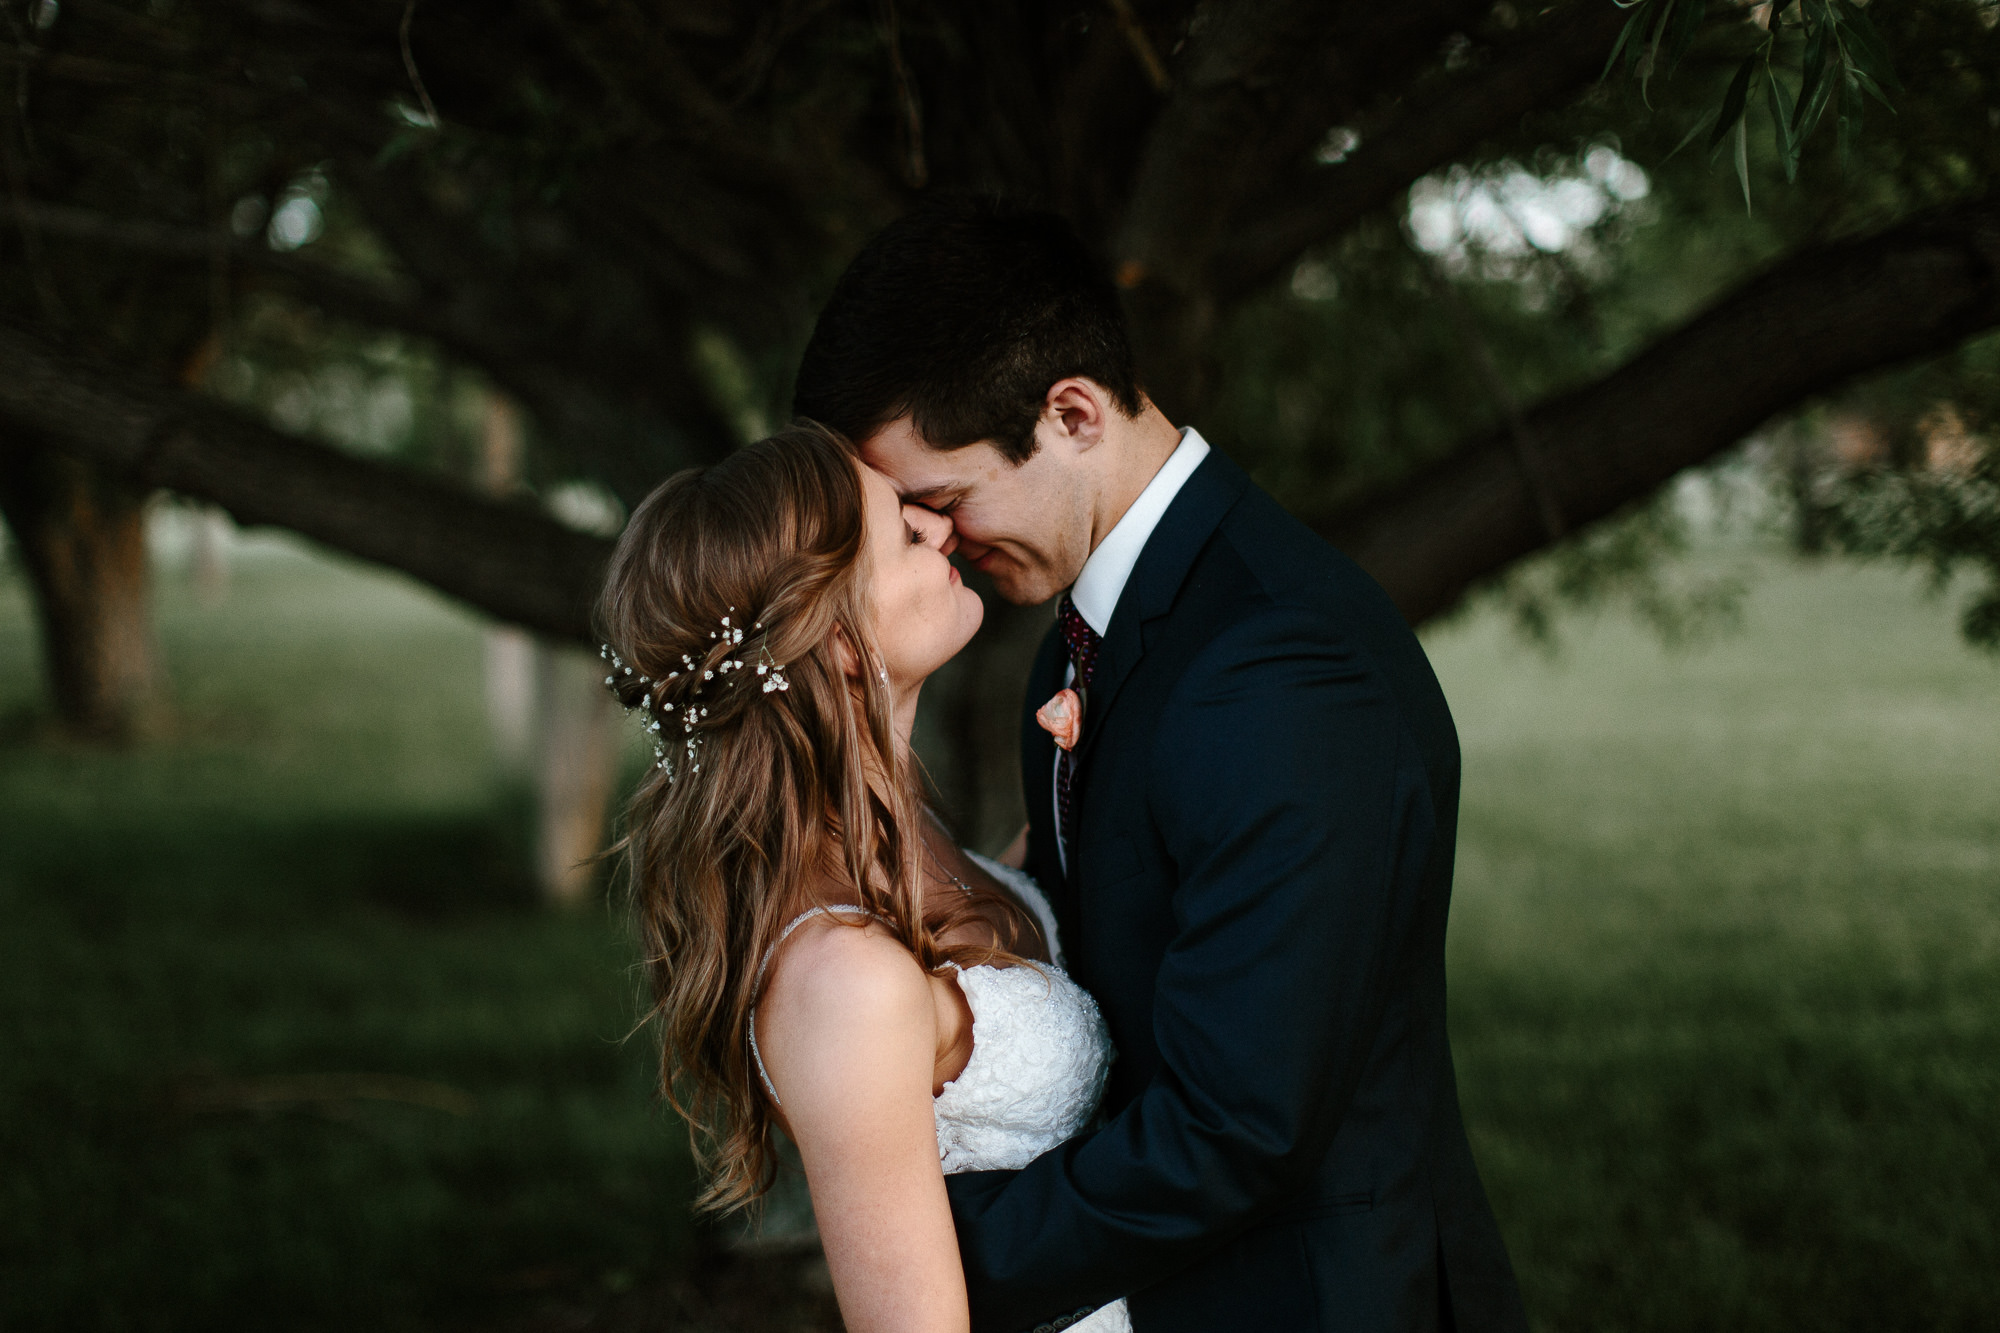 wedding-elopement-adventerous-romantic-timeless-south-dakota-blue-haven-barn-086.jpg